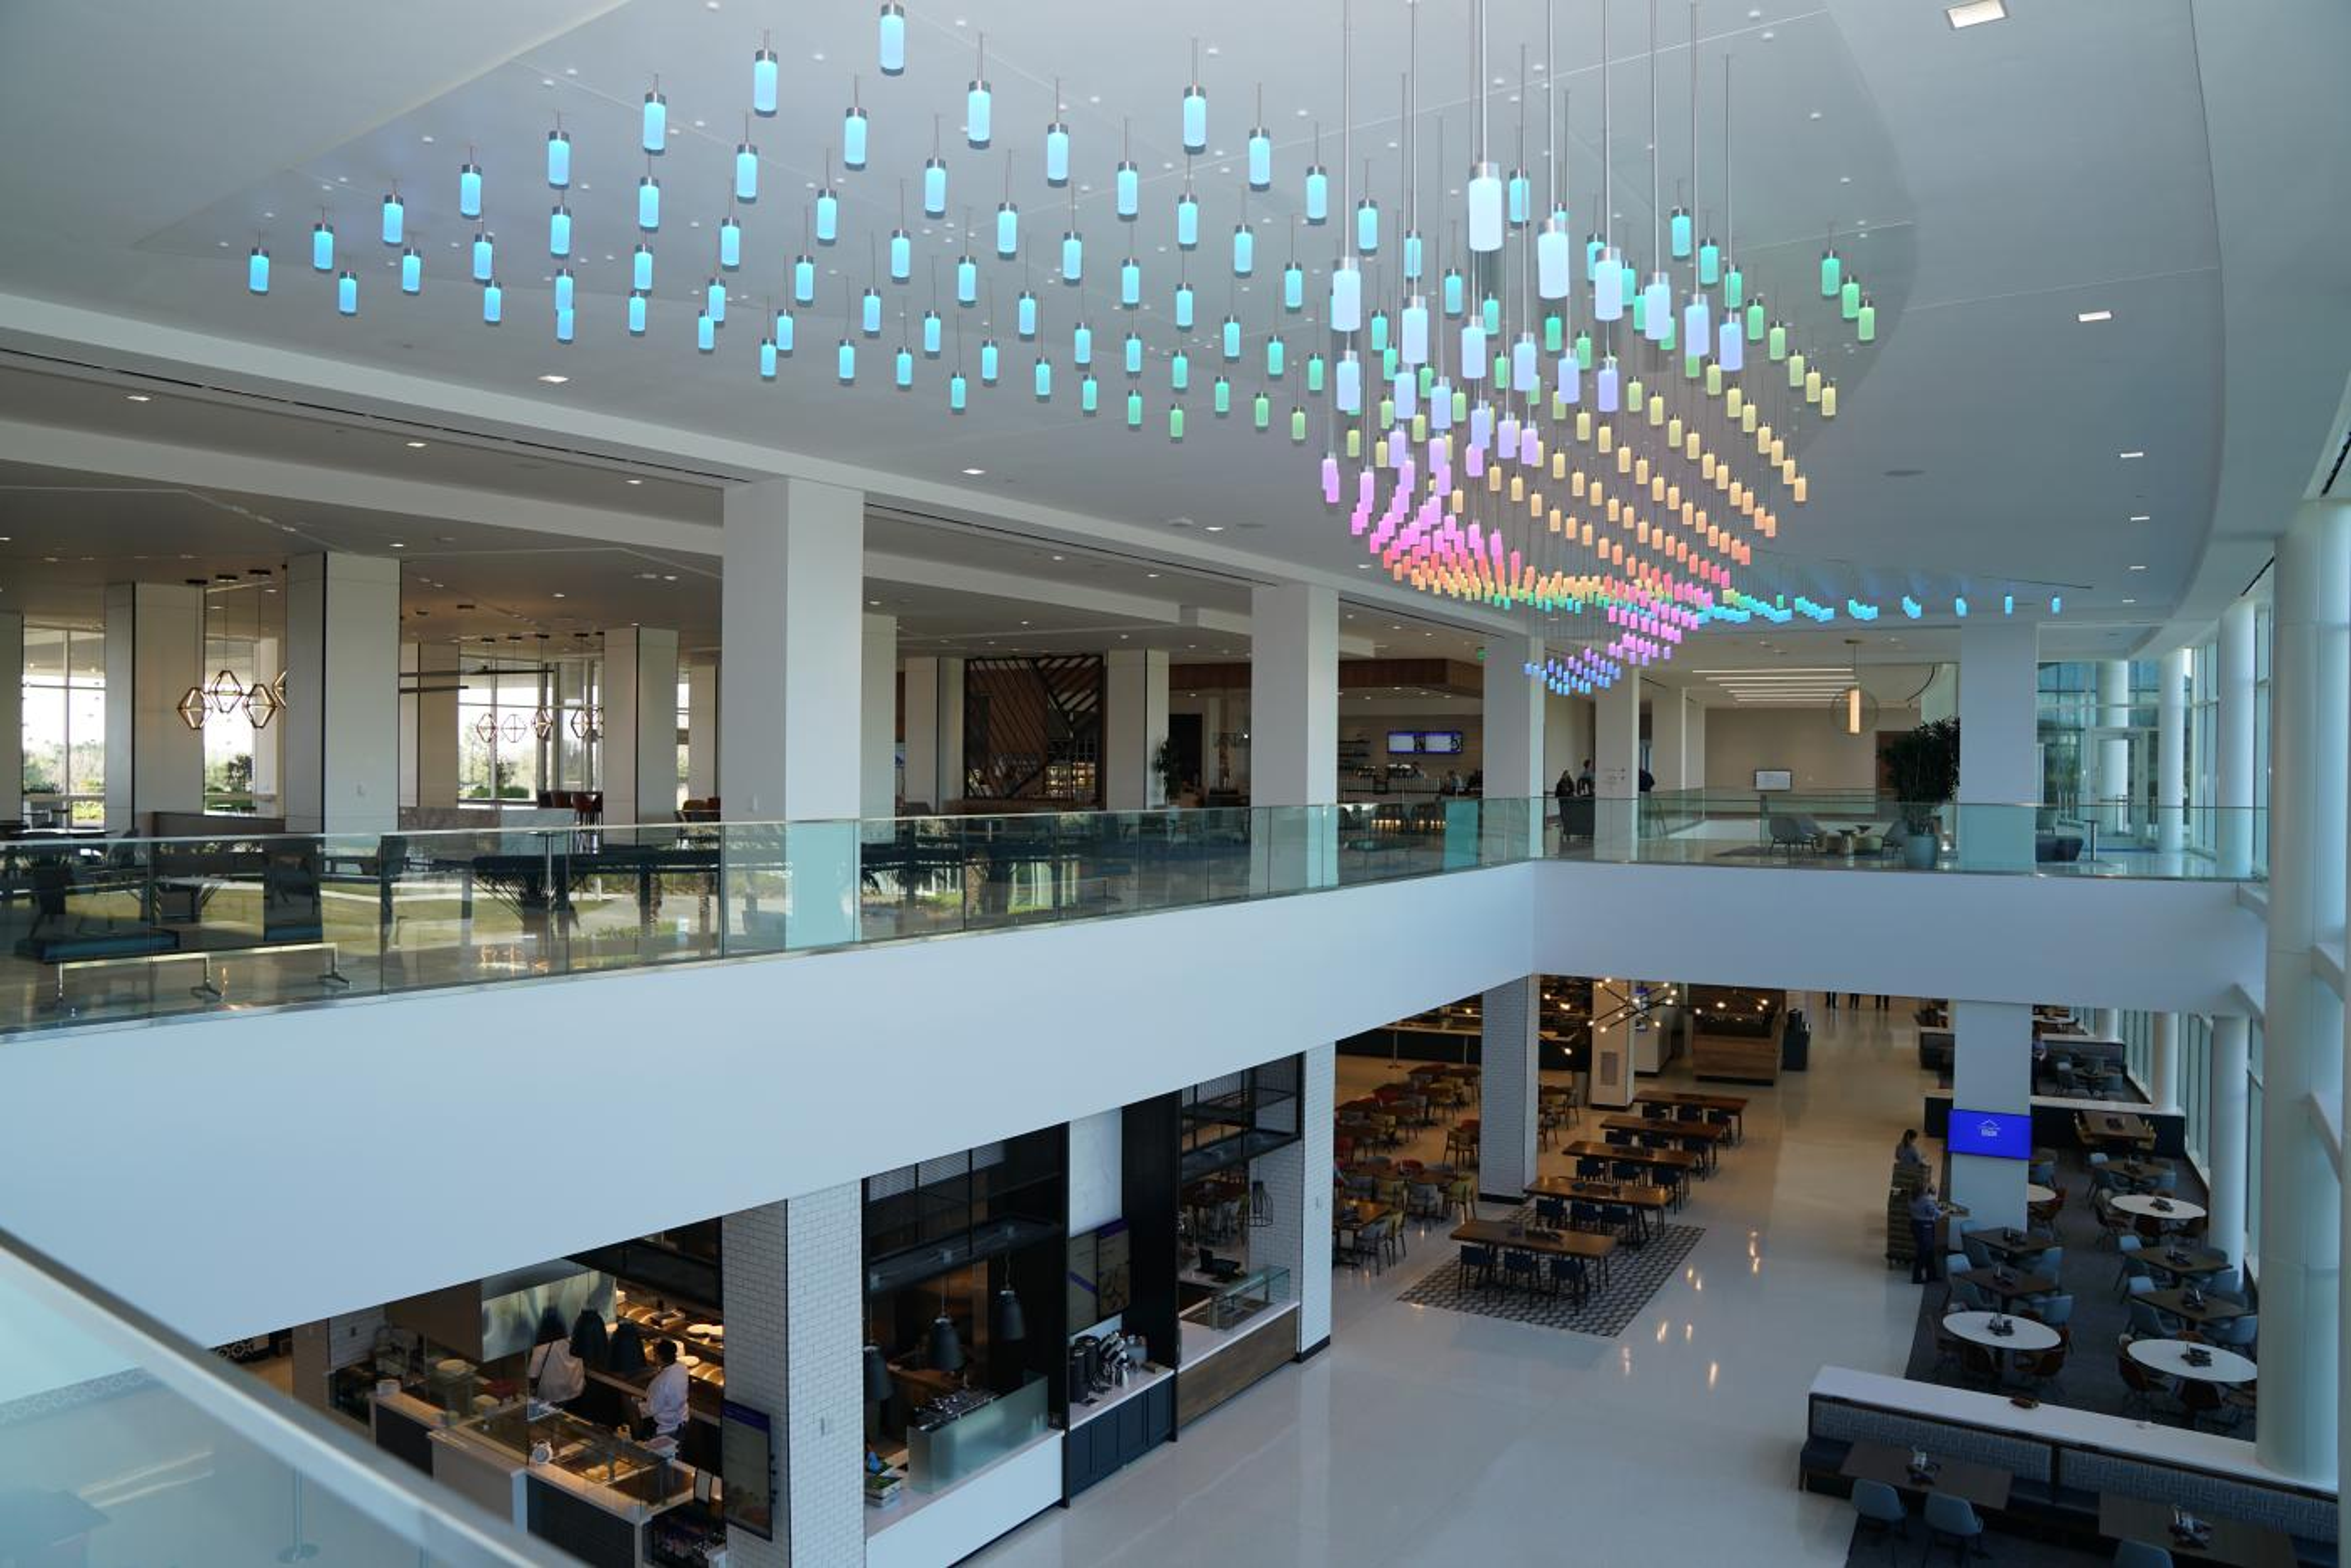 KPMG's new $450 million employee training hub is a locus of experience design